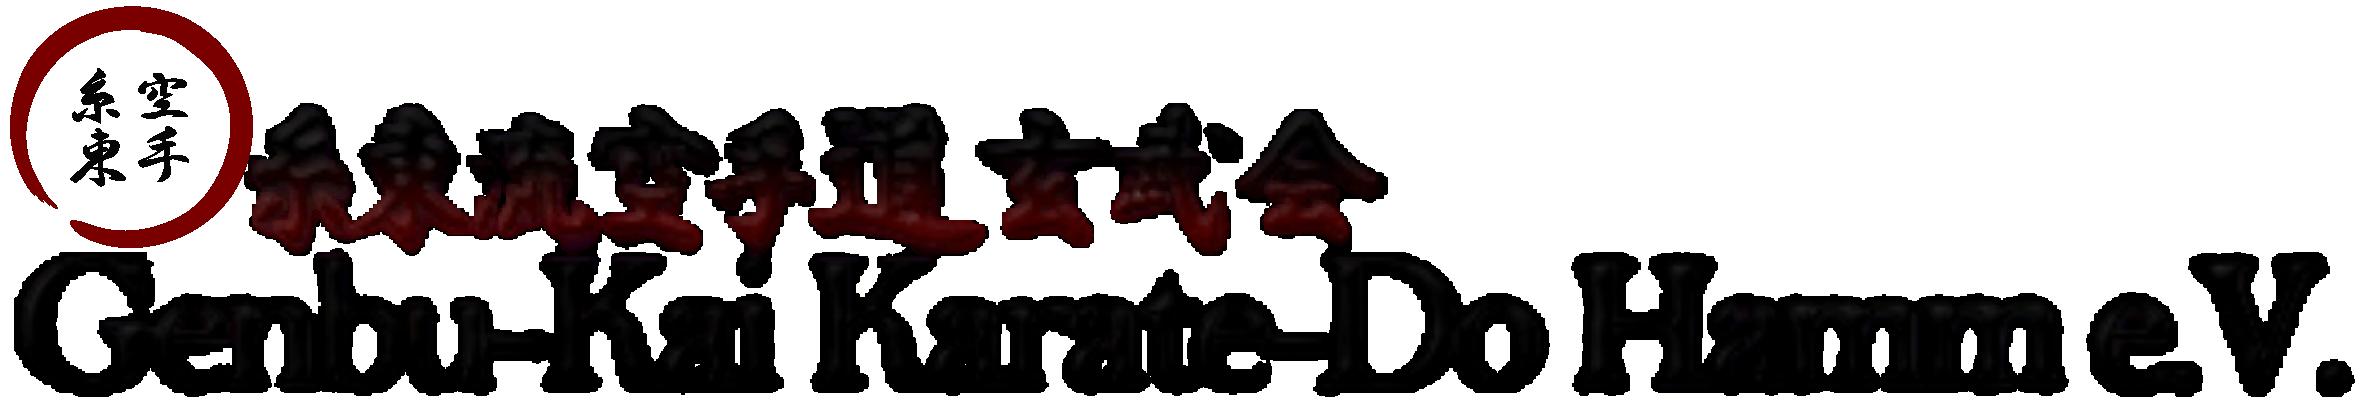 Genbu-Kai Karate-Do Hamm e.V.